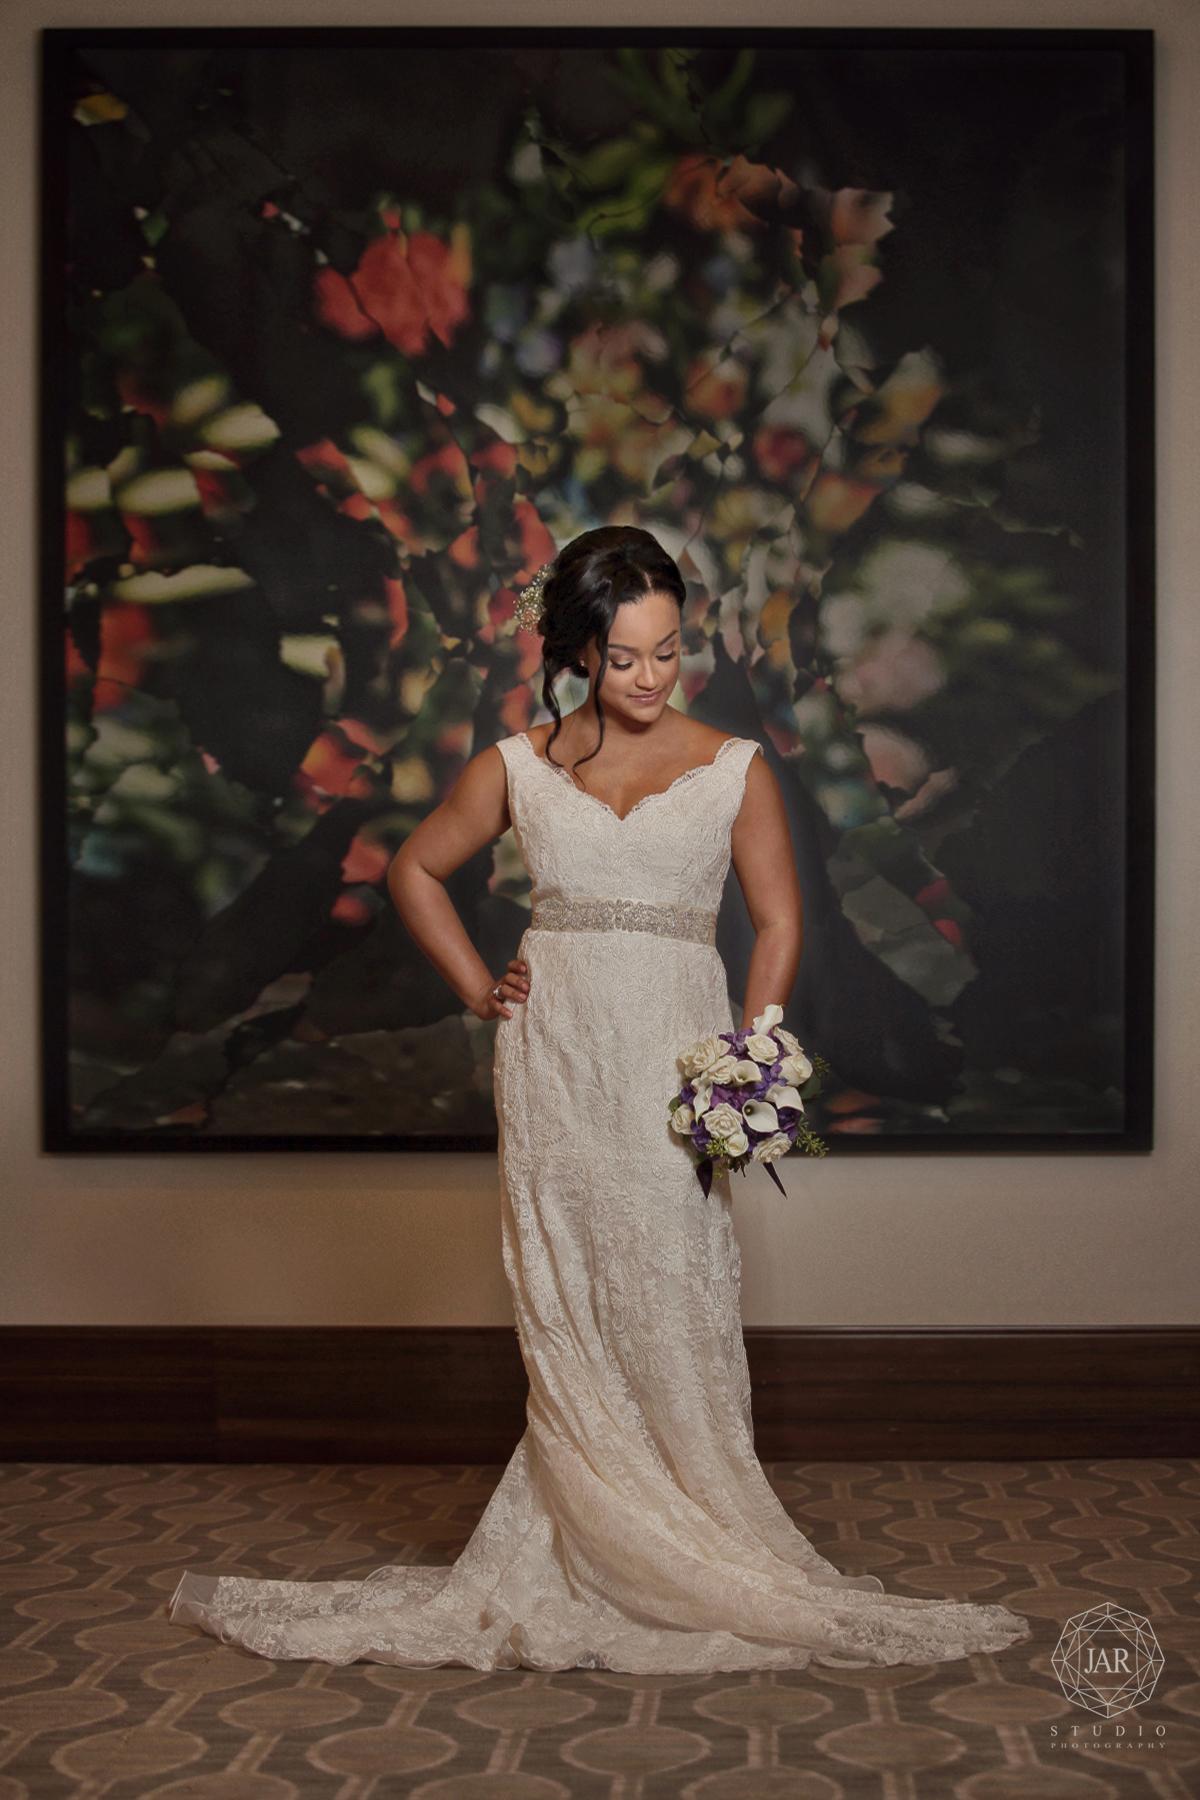 06-alfond-inn-wedding-bride-dress-flowers-jarstudio.JPG